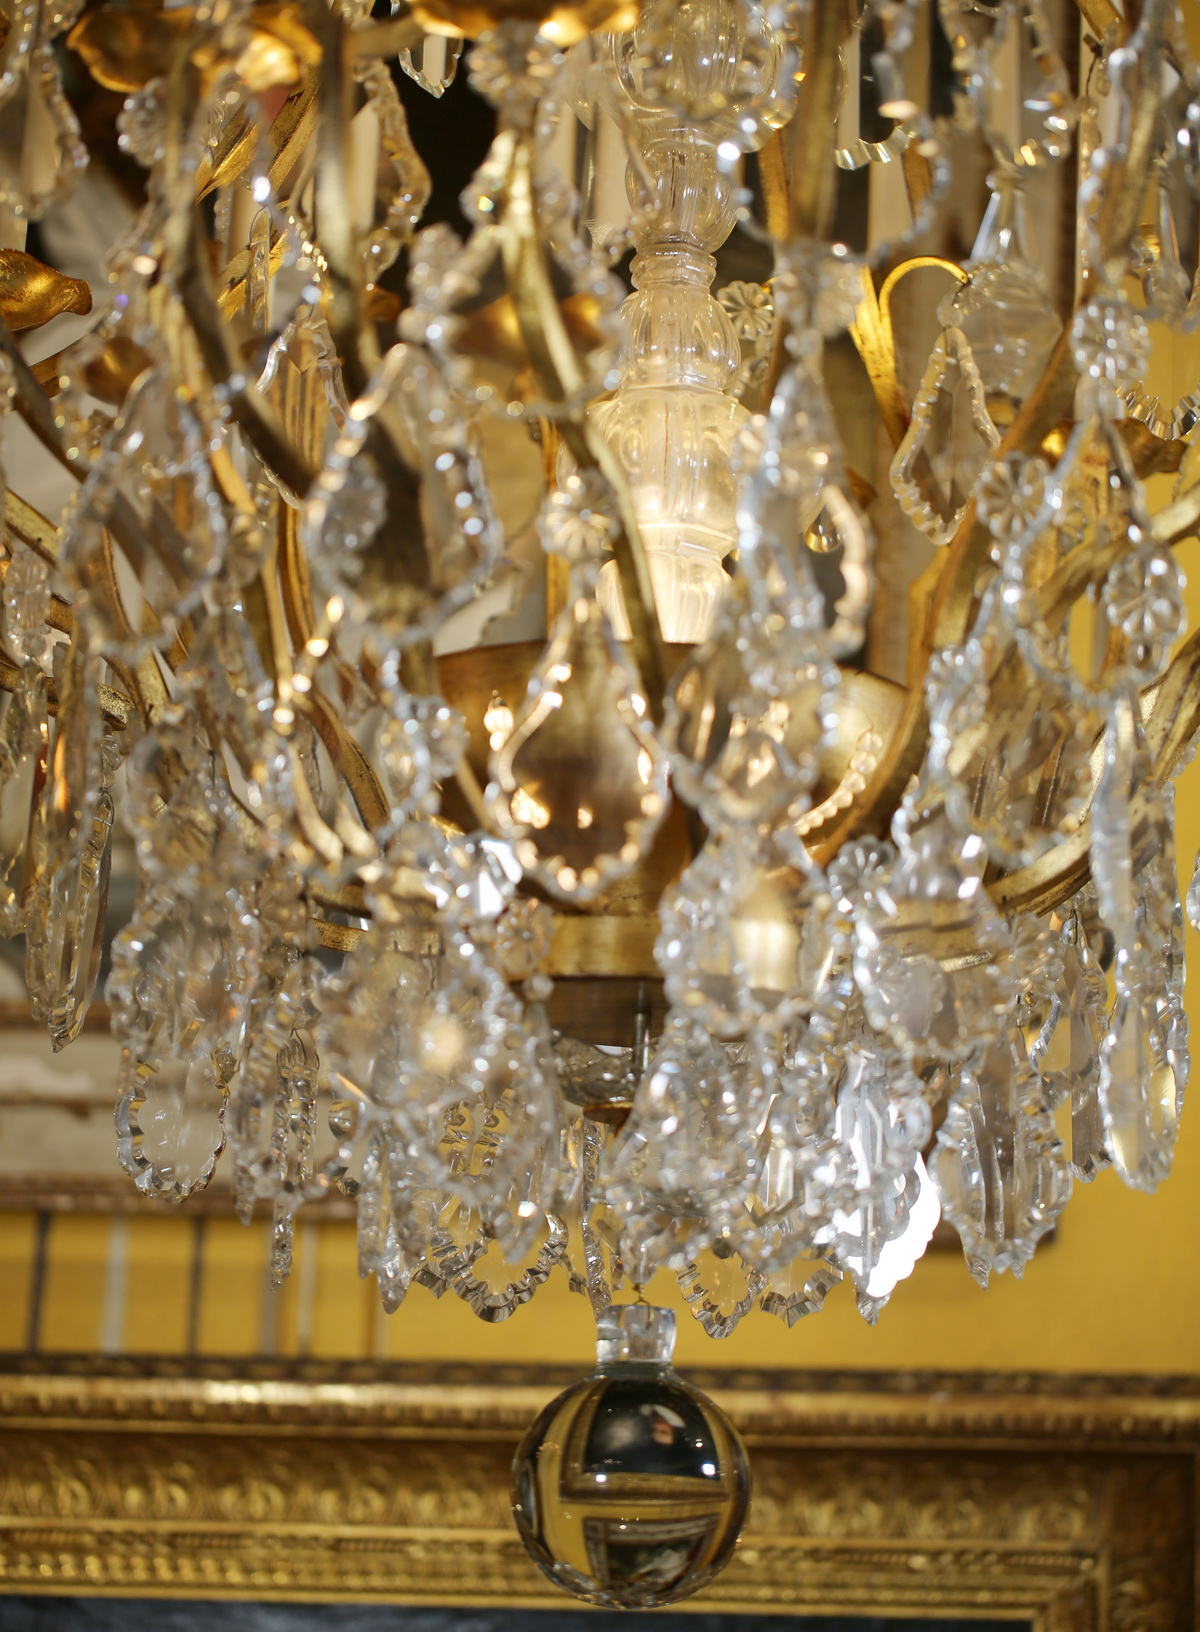 Maison Bagues Louis XV style cage chandelier.